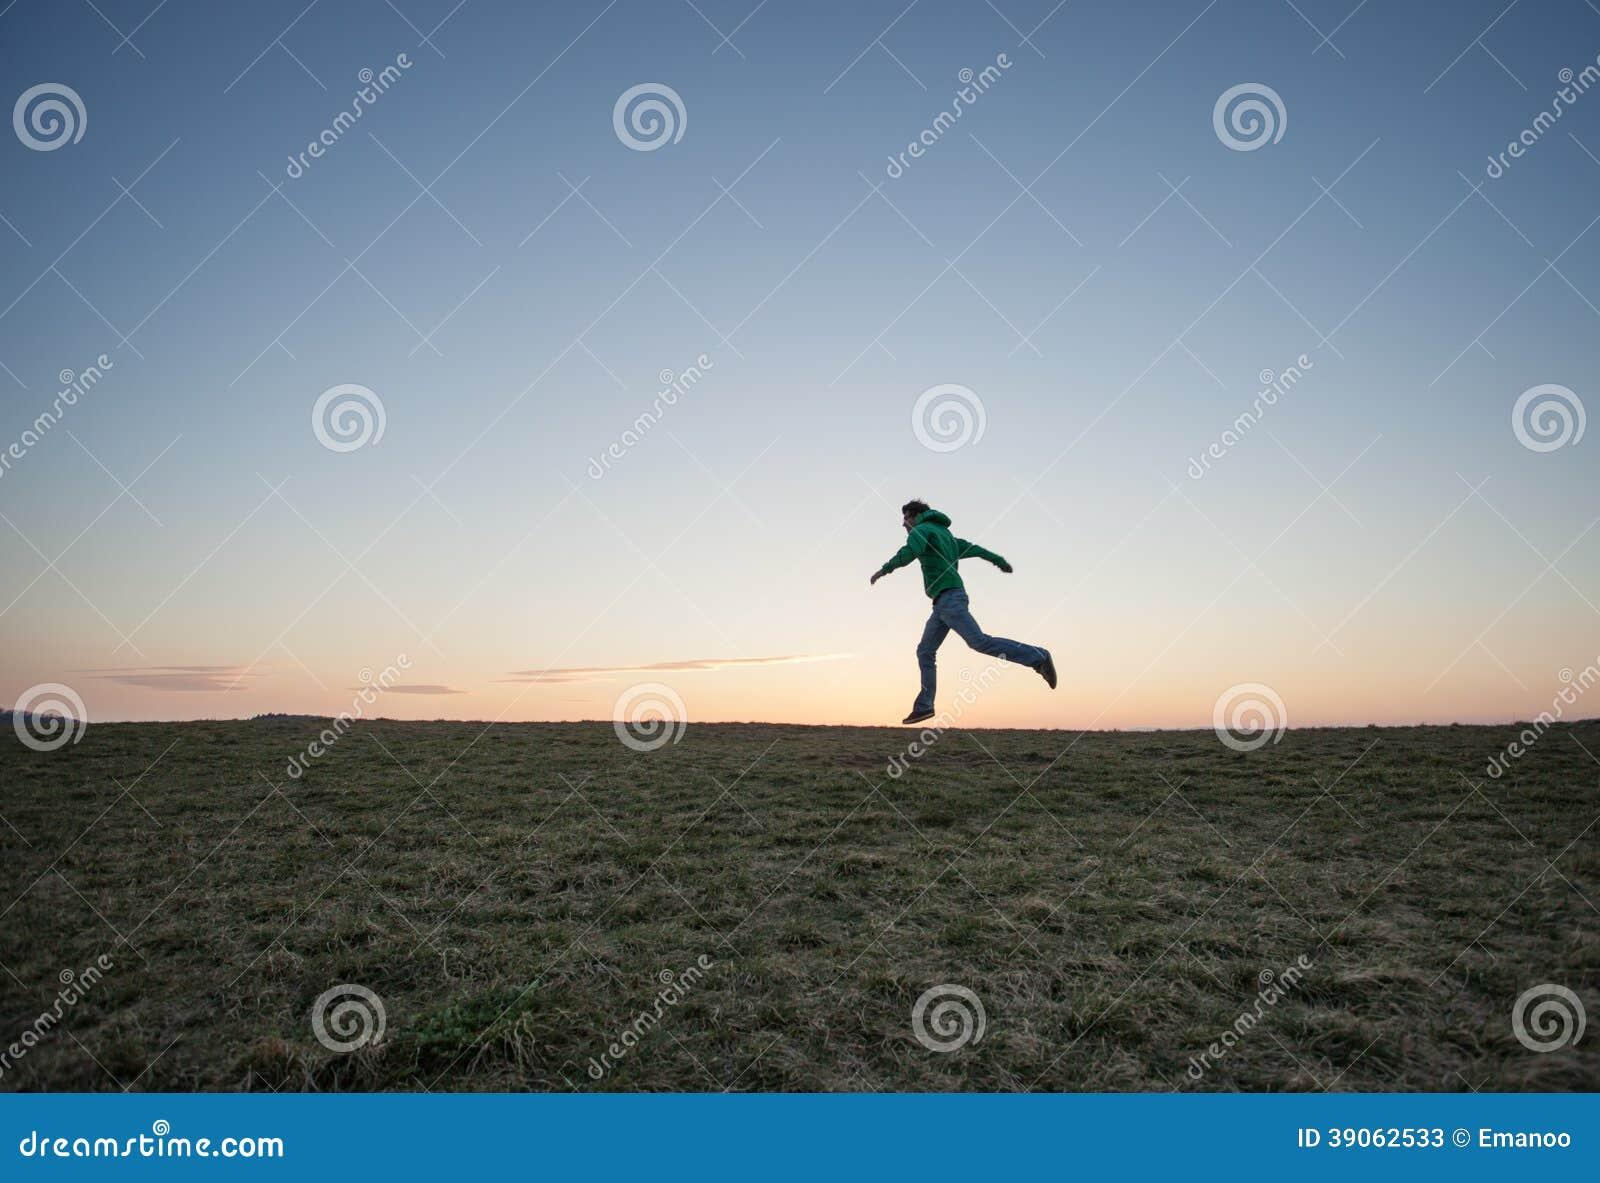 Man running in sunset sky on hill